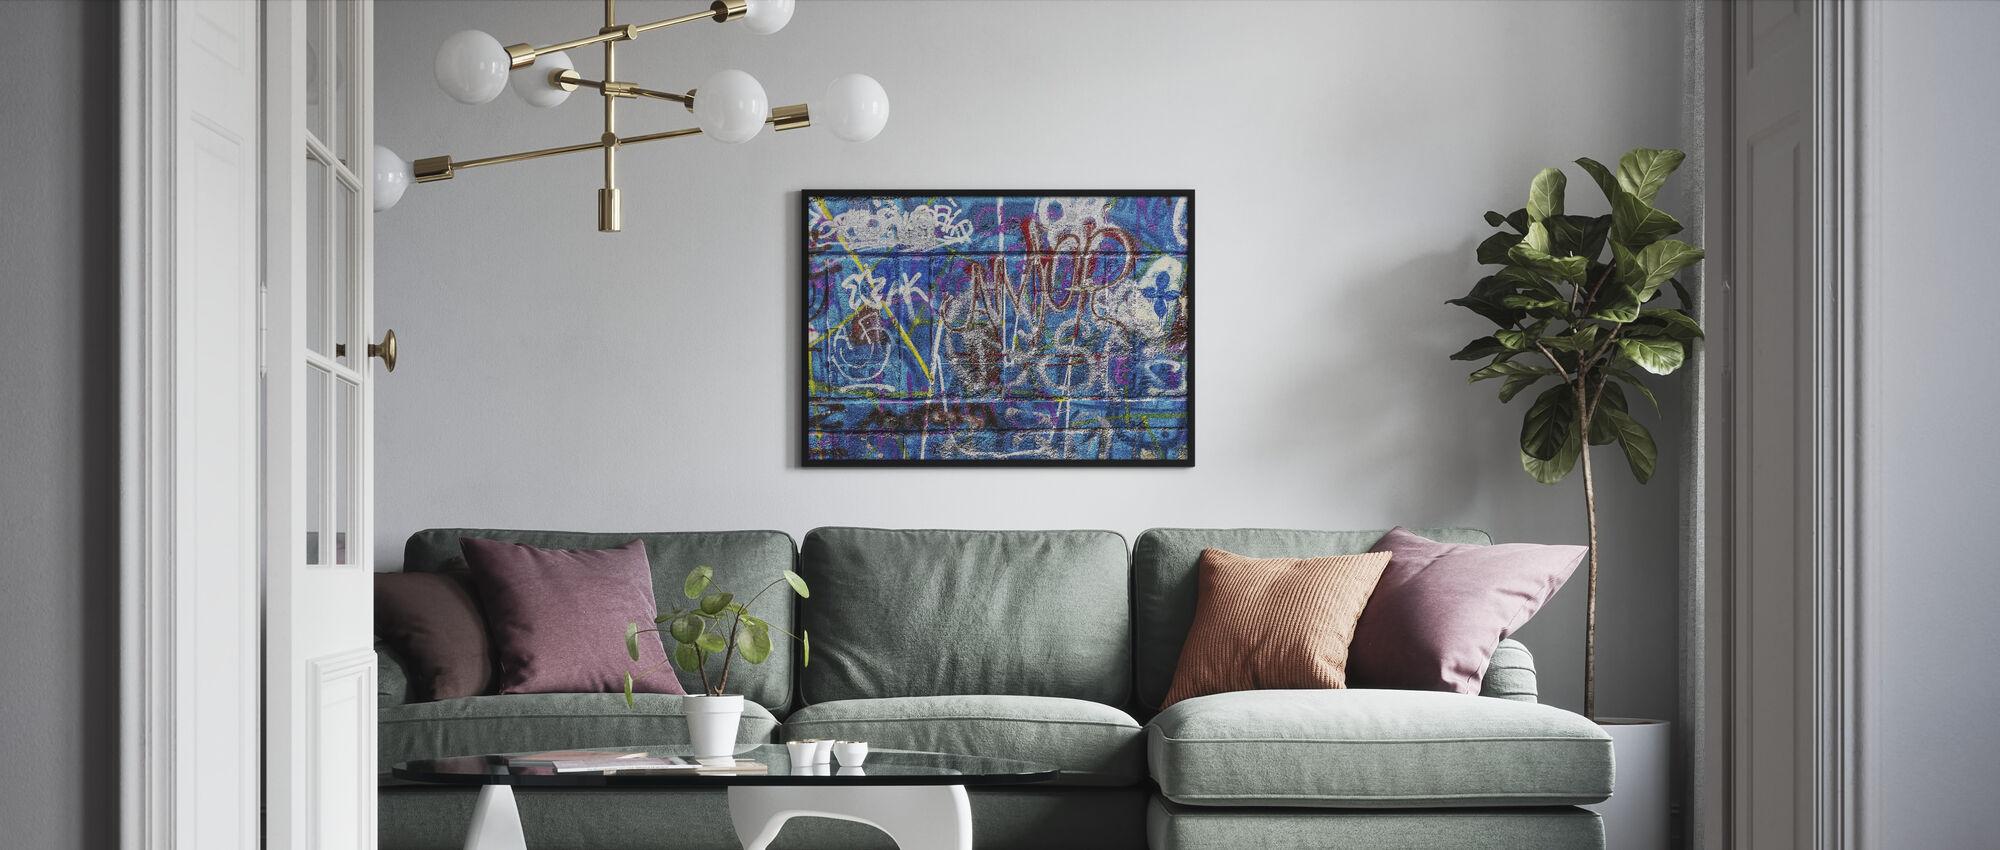 Wall Street Art - Framed print - Living Room